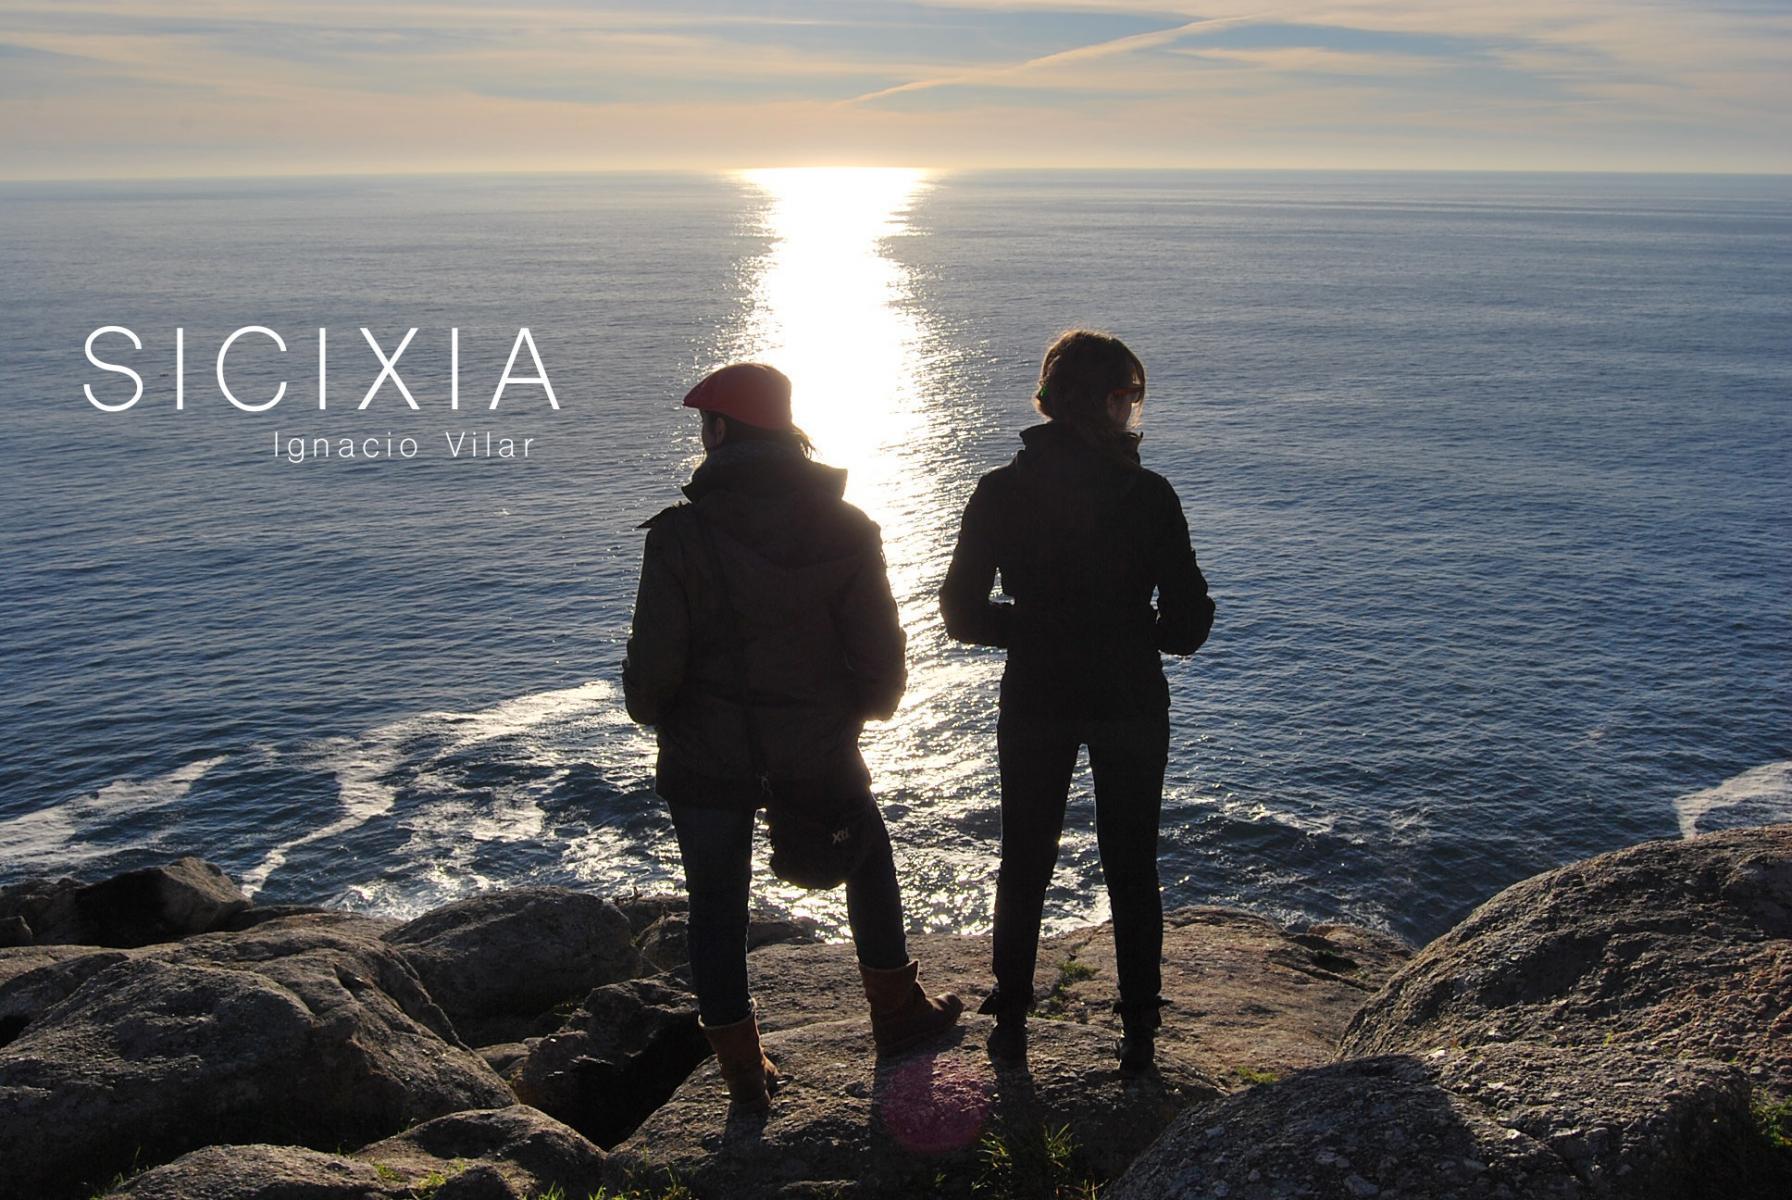 Cinema: Sicixia